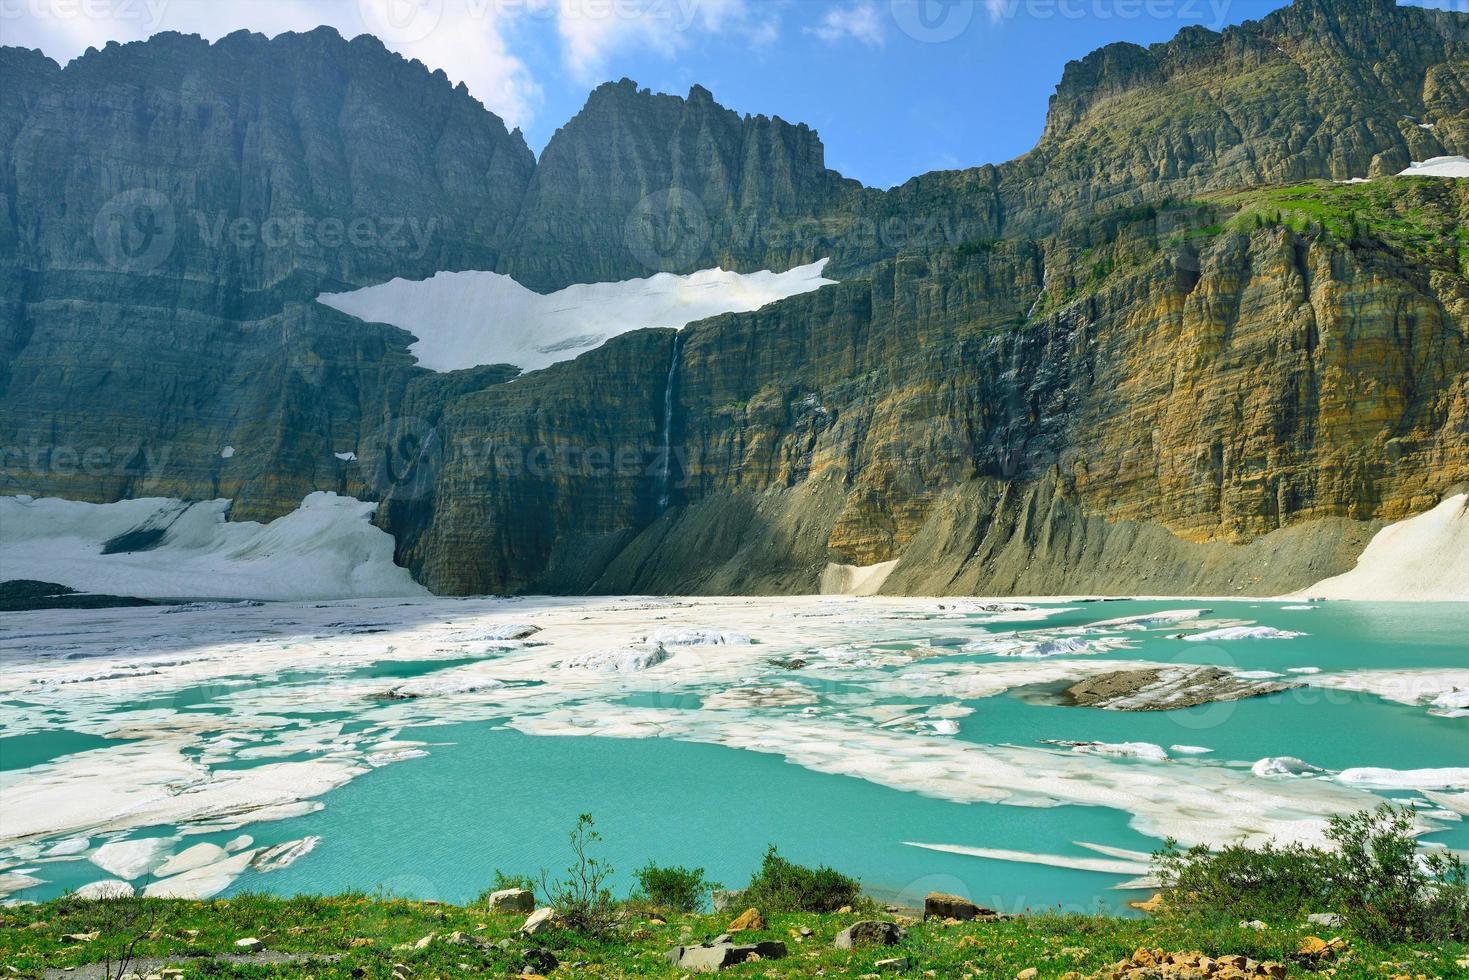 Grinnell glacier in Many Glaciers, Glacier National Park, Montana photo